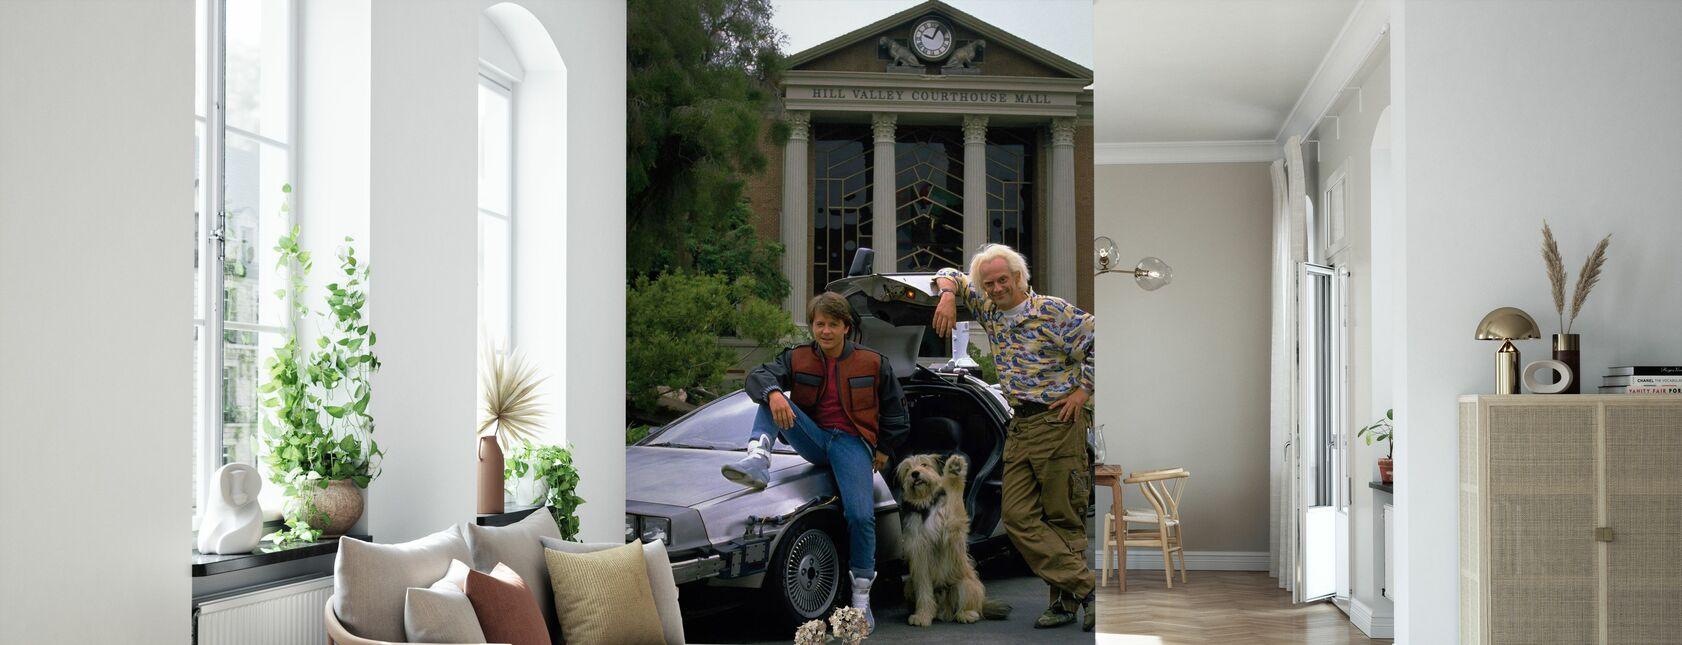 Back to the Future - Michael J Fox - Wallpaper - Living Room